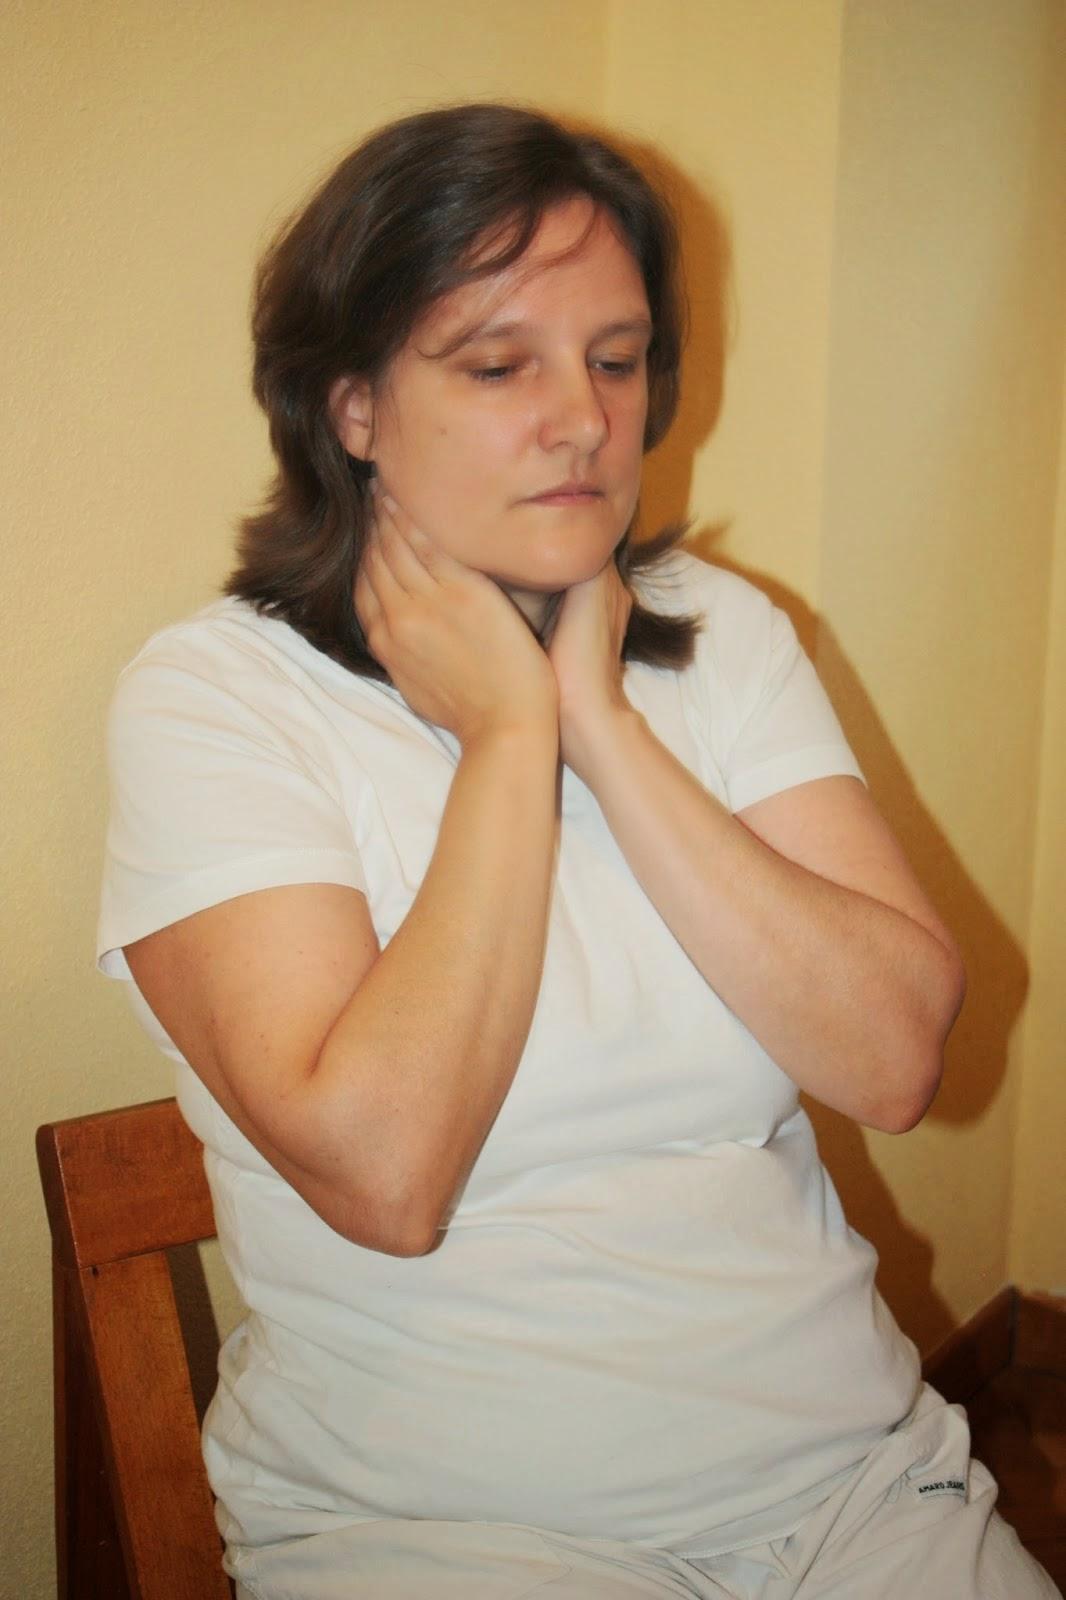 7 consejos para perder peso con Reiki de manera sana